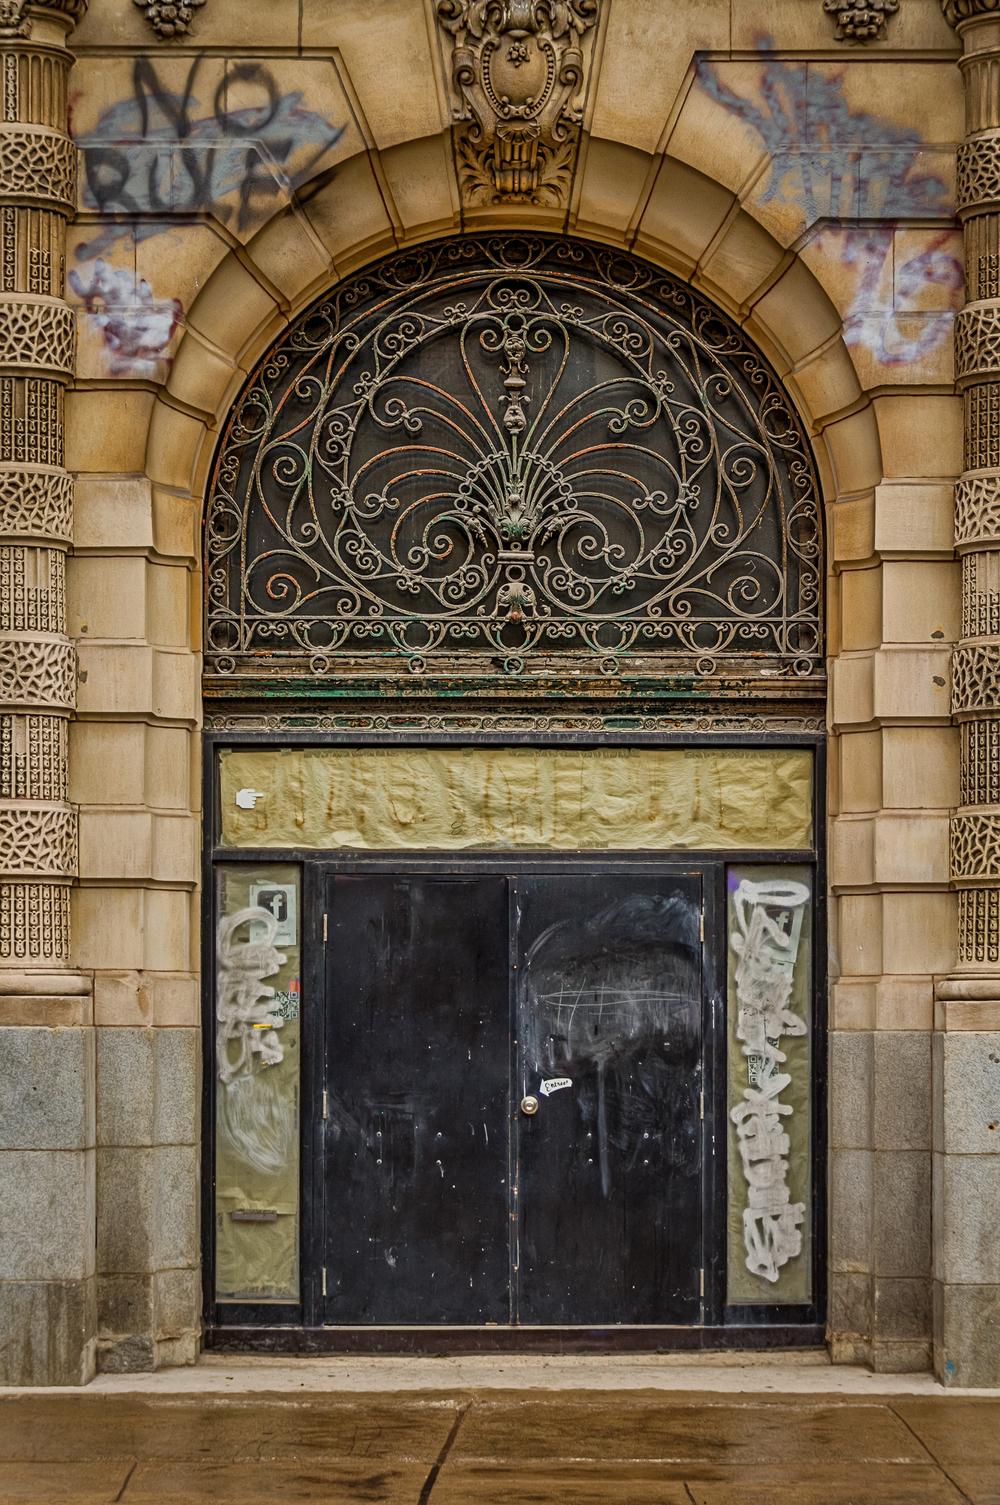 20140816_Grafitti and Architechture - Latin Quarter_IMG_5729_HDR-M.jpg